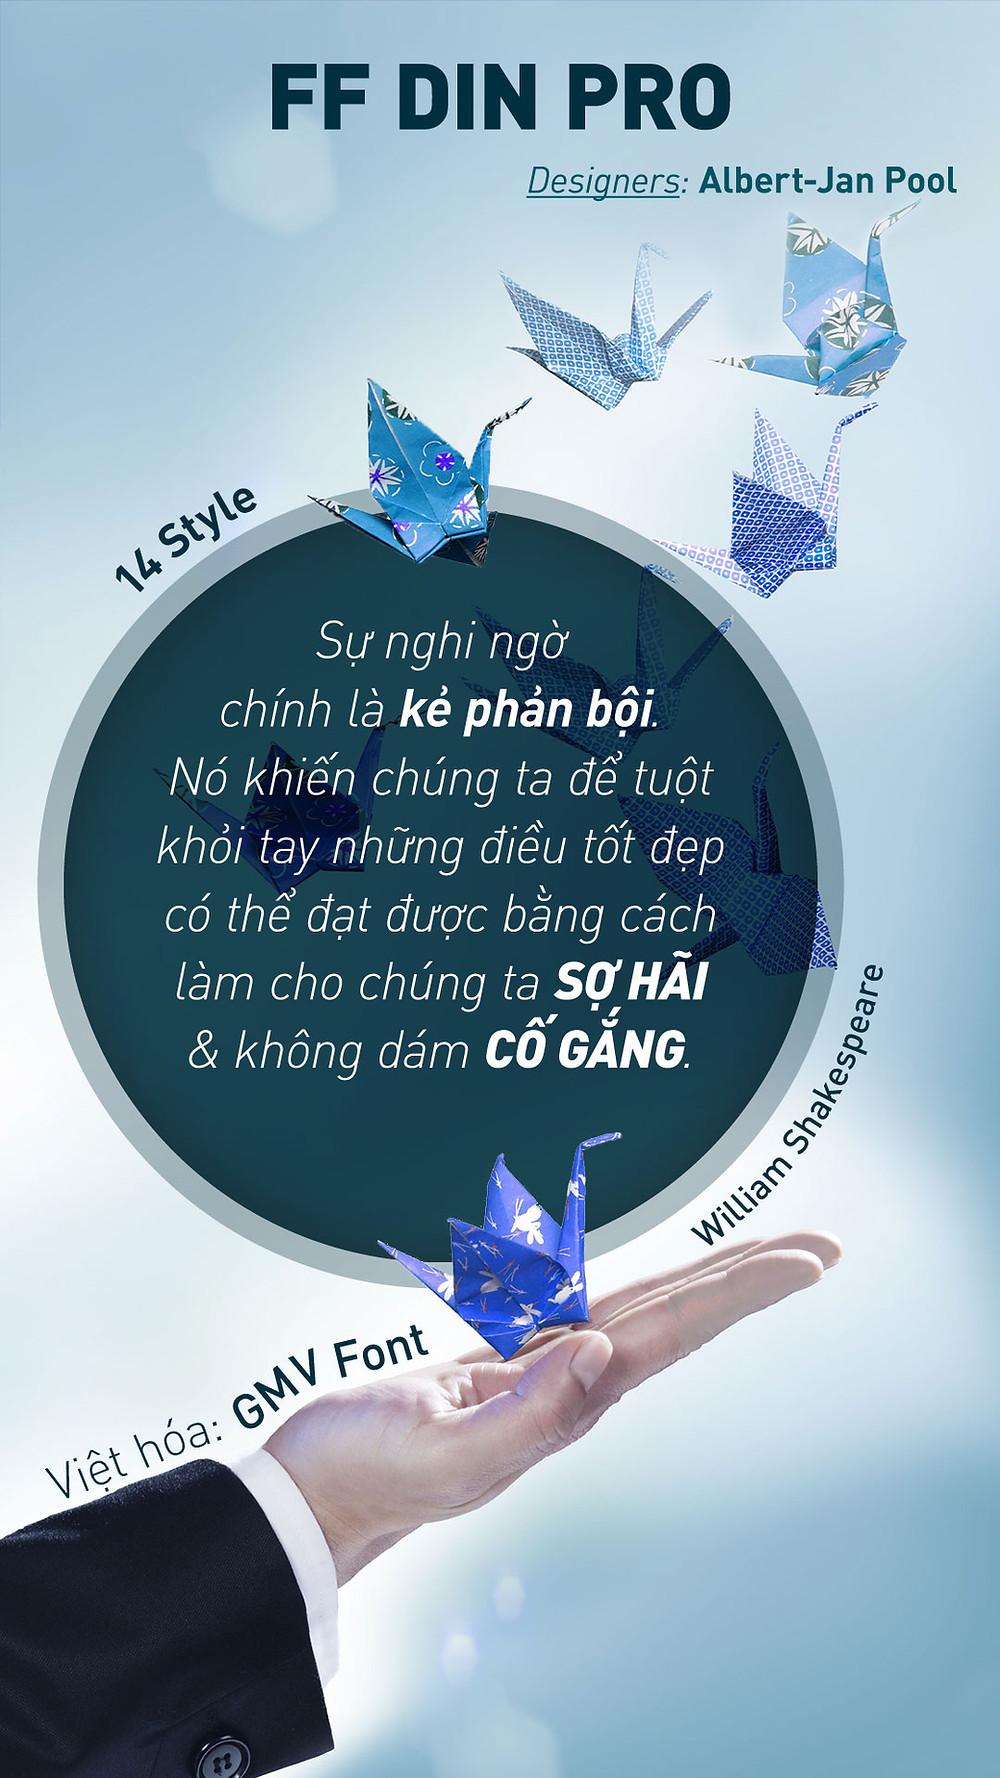 Font GMV FF Din Pro Full Việt Hóa